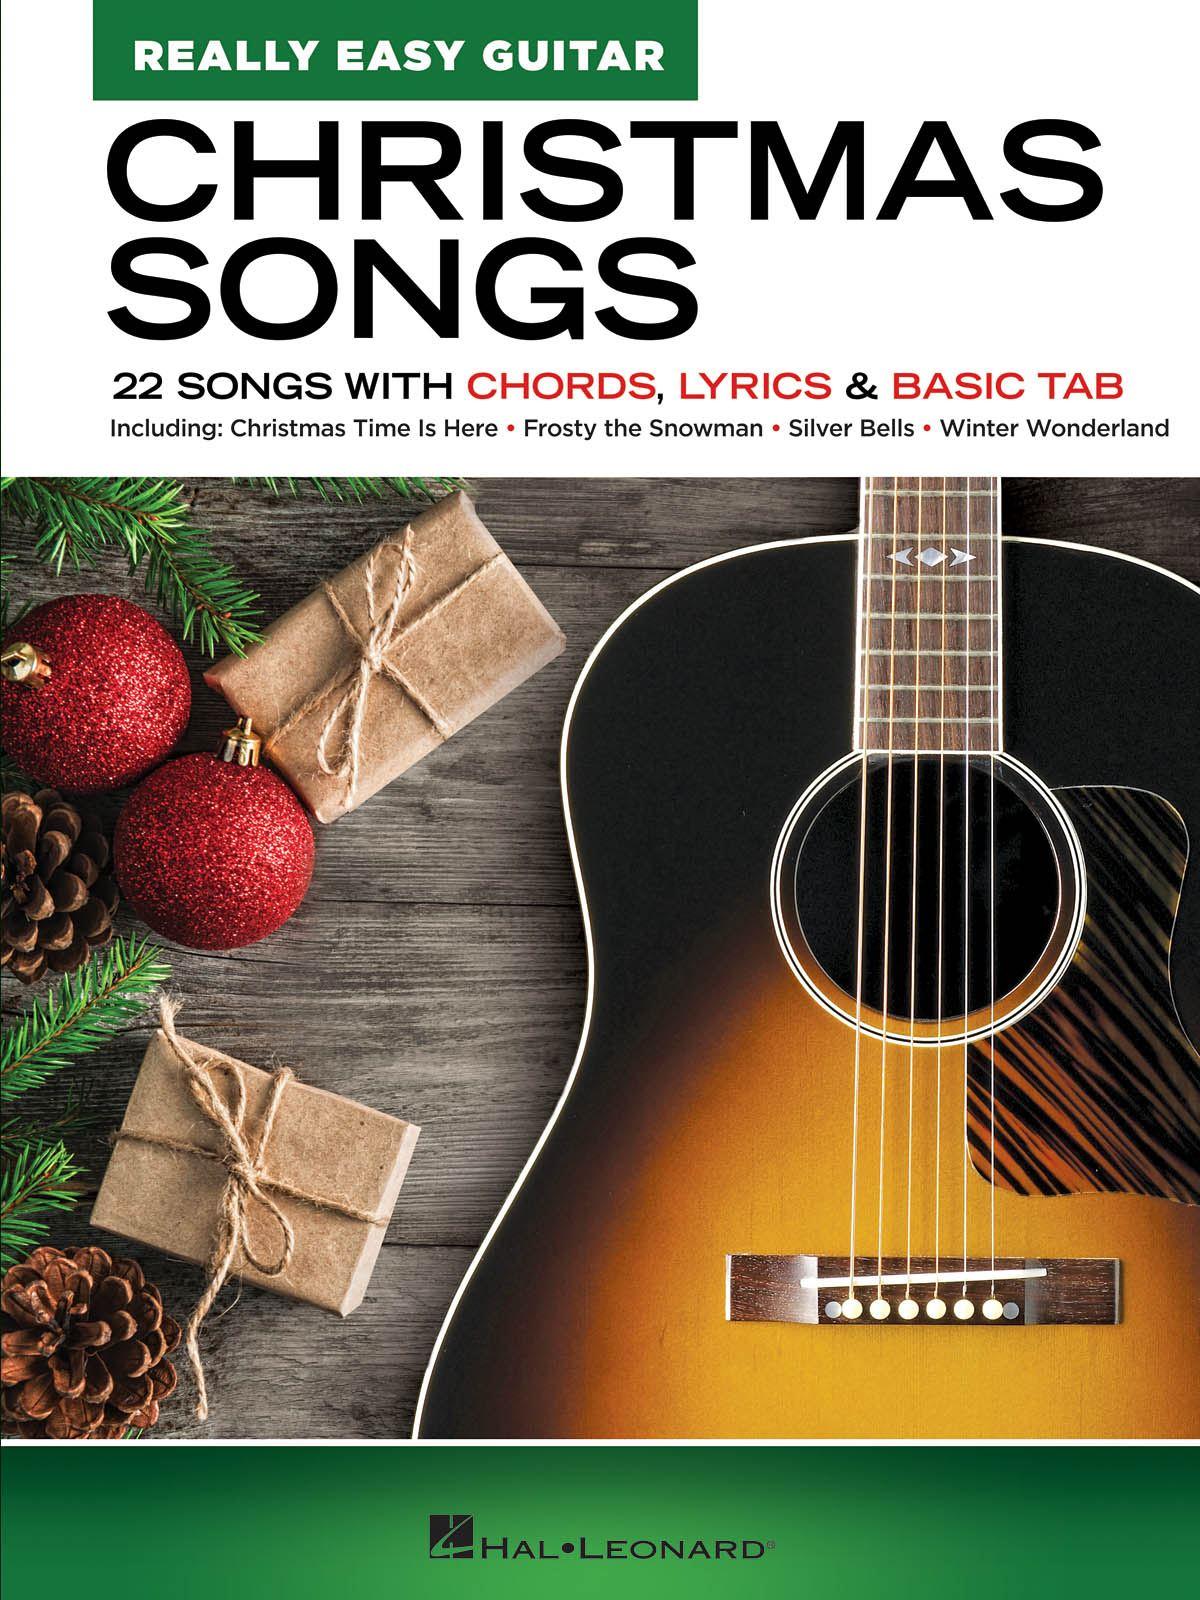 Christmas Songs - Really Easy Guitar Series